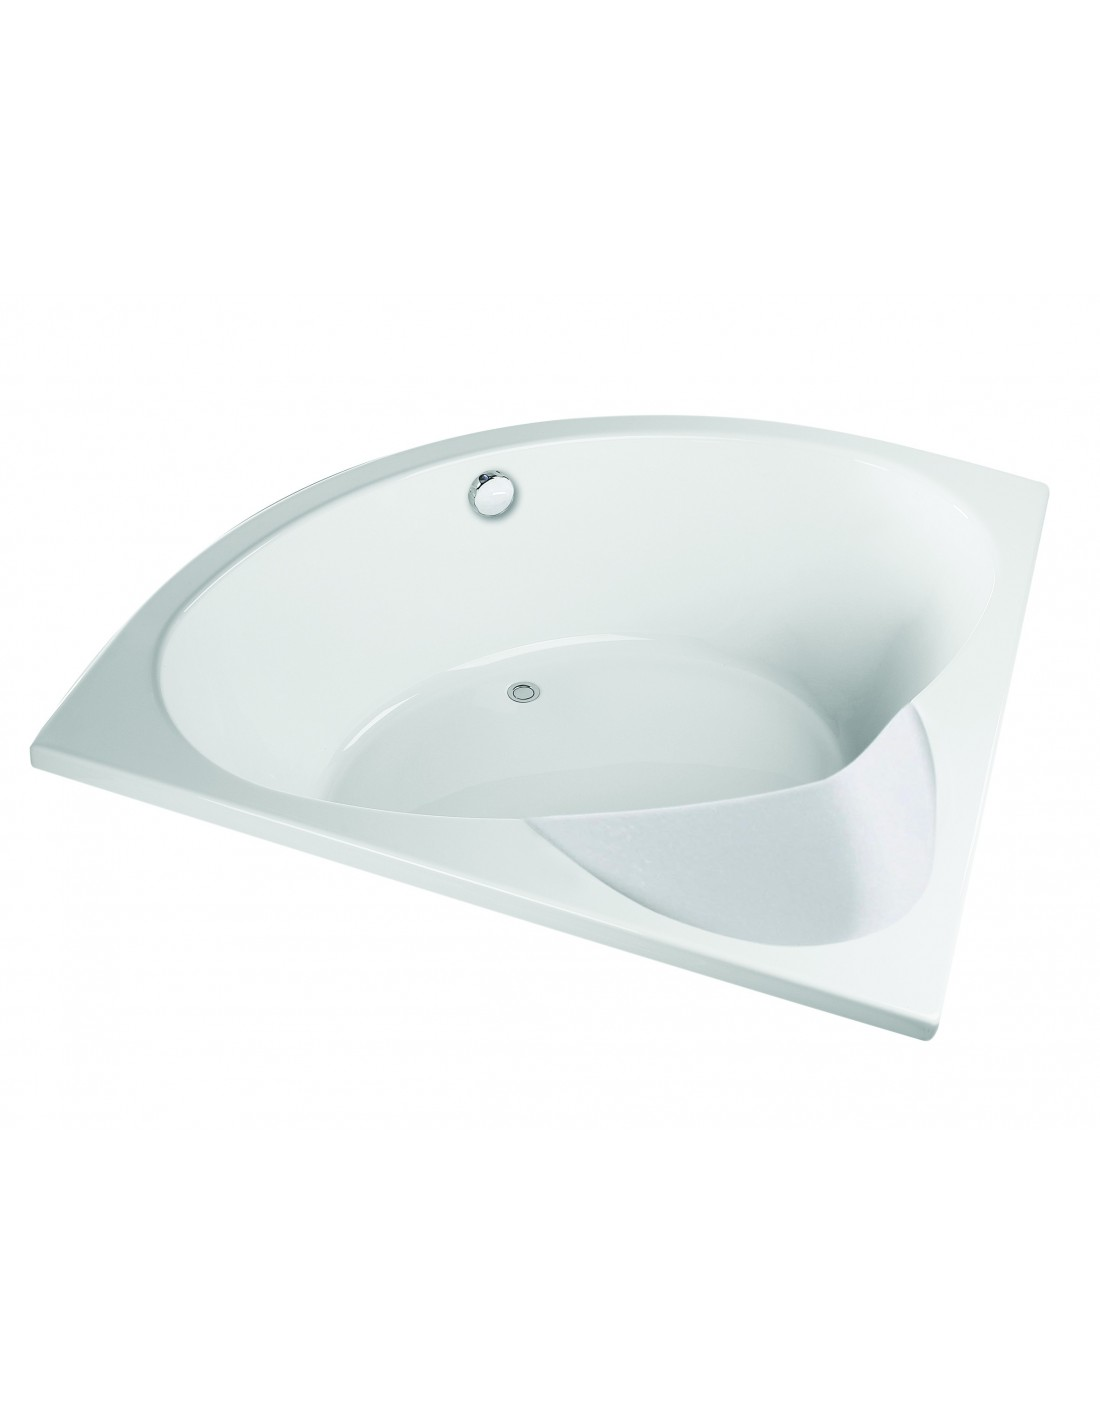 baignoire d angle compacte assise incluse premium valentin